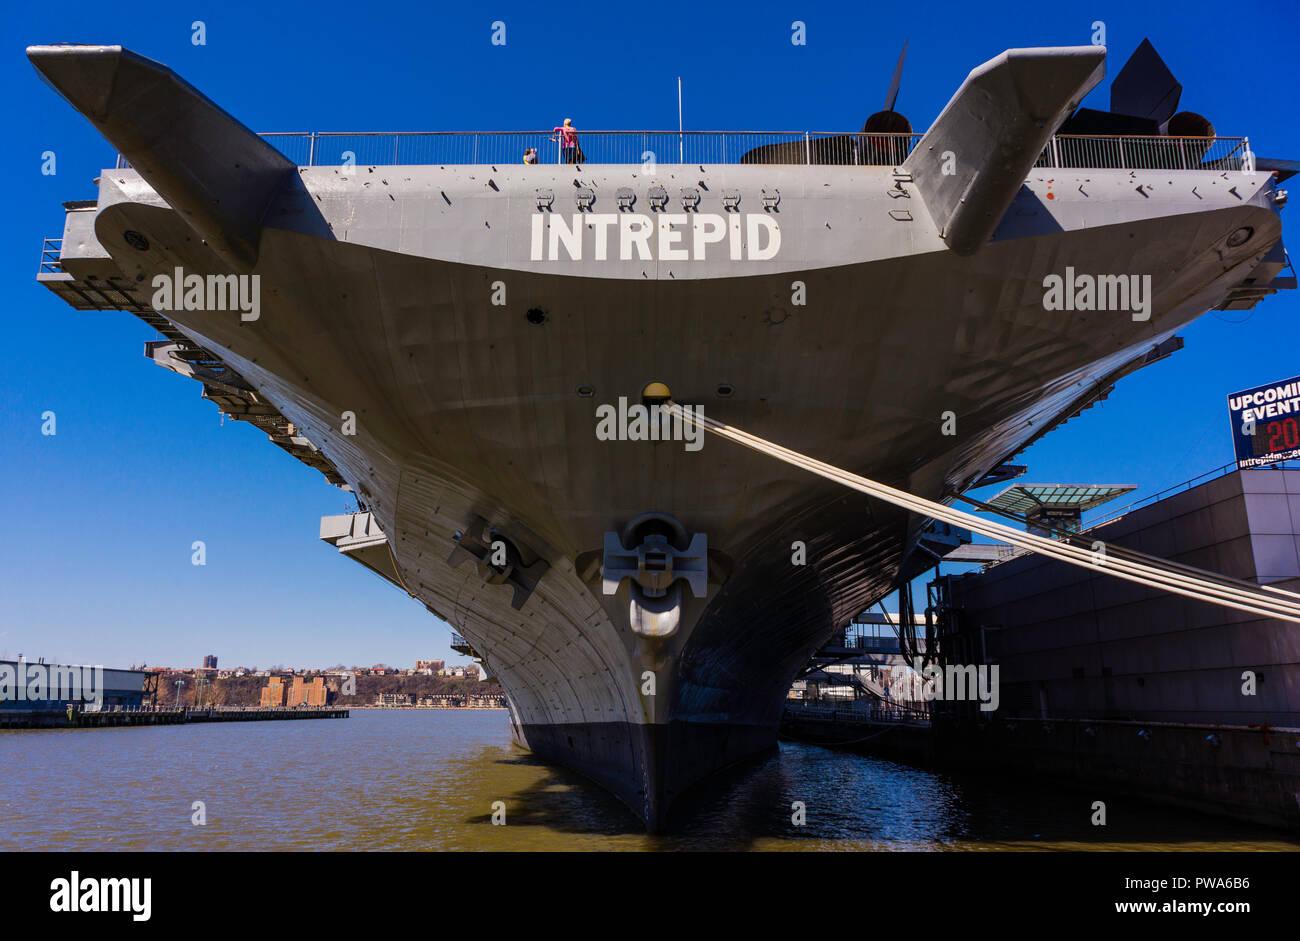 Intrepid Sea, Air & Space Museum Manhattan _ New York, New York, USA - Stock Image